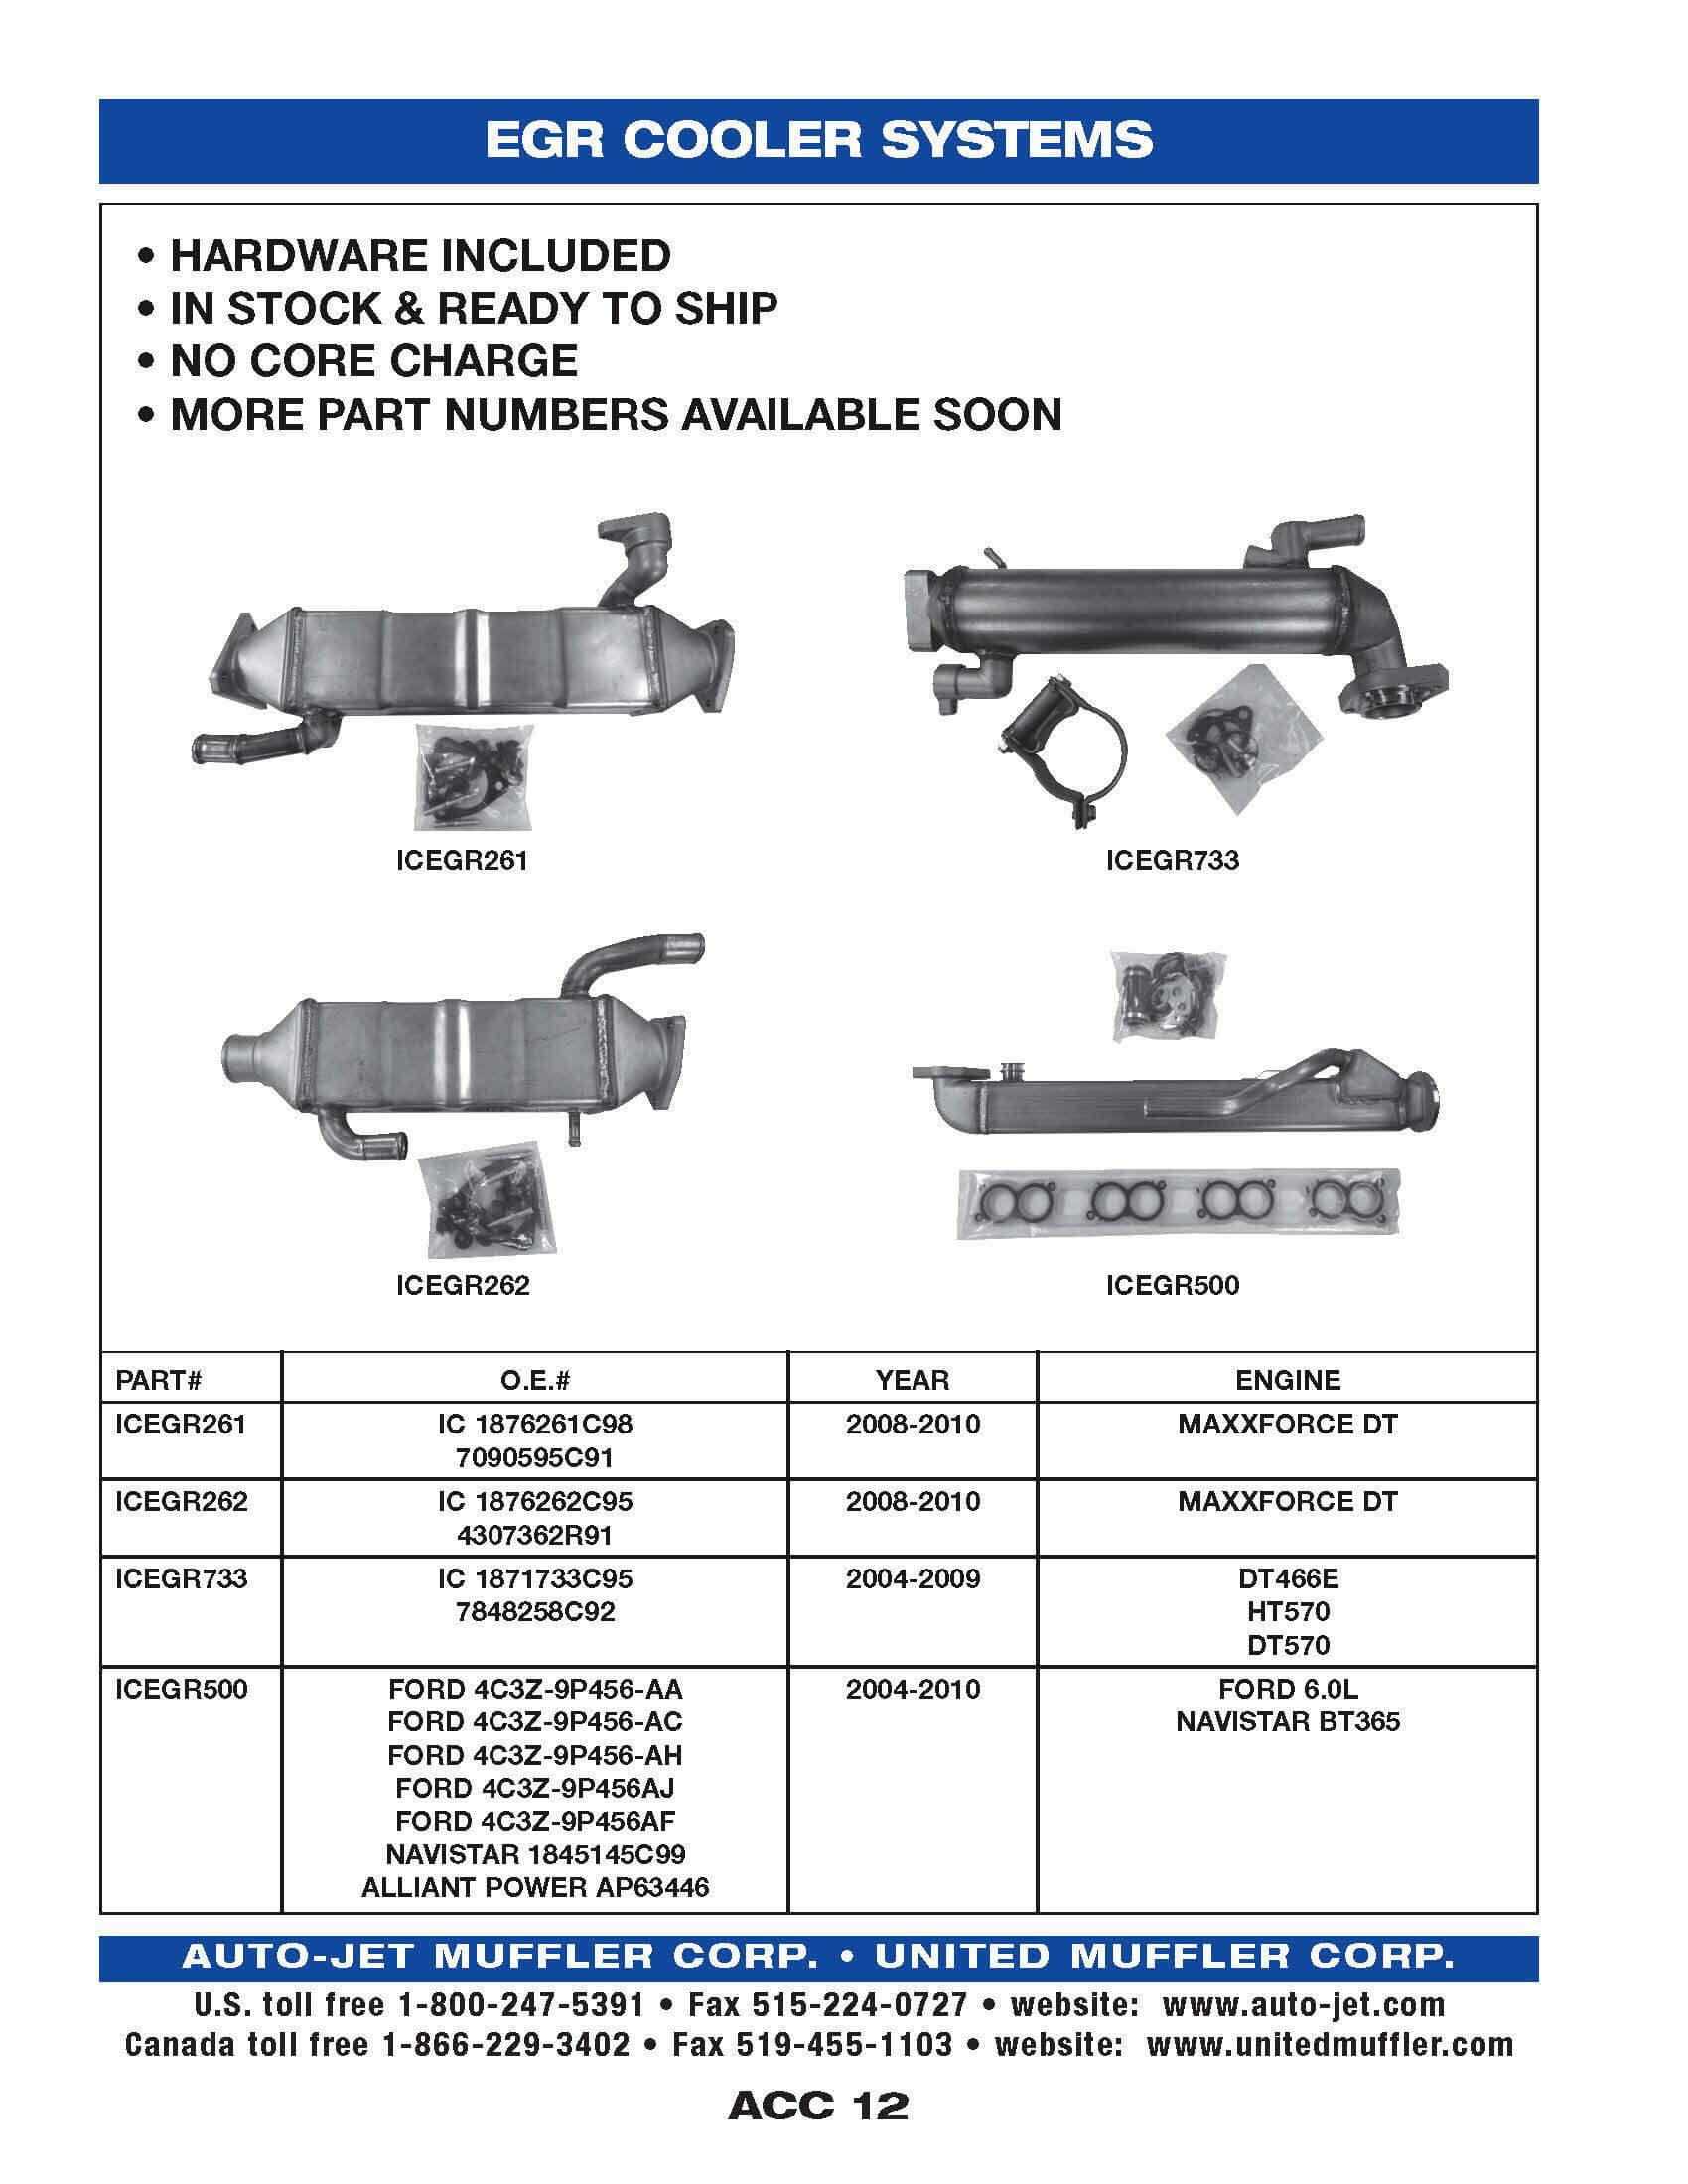 navistar ht 570 engine diagram accessories united muffler corporation  accessories united muffler corporation